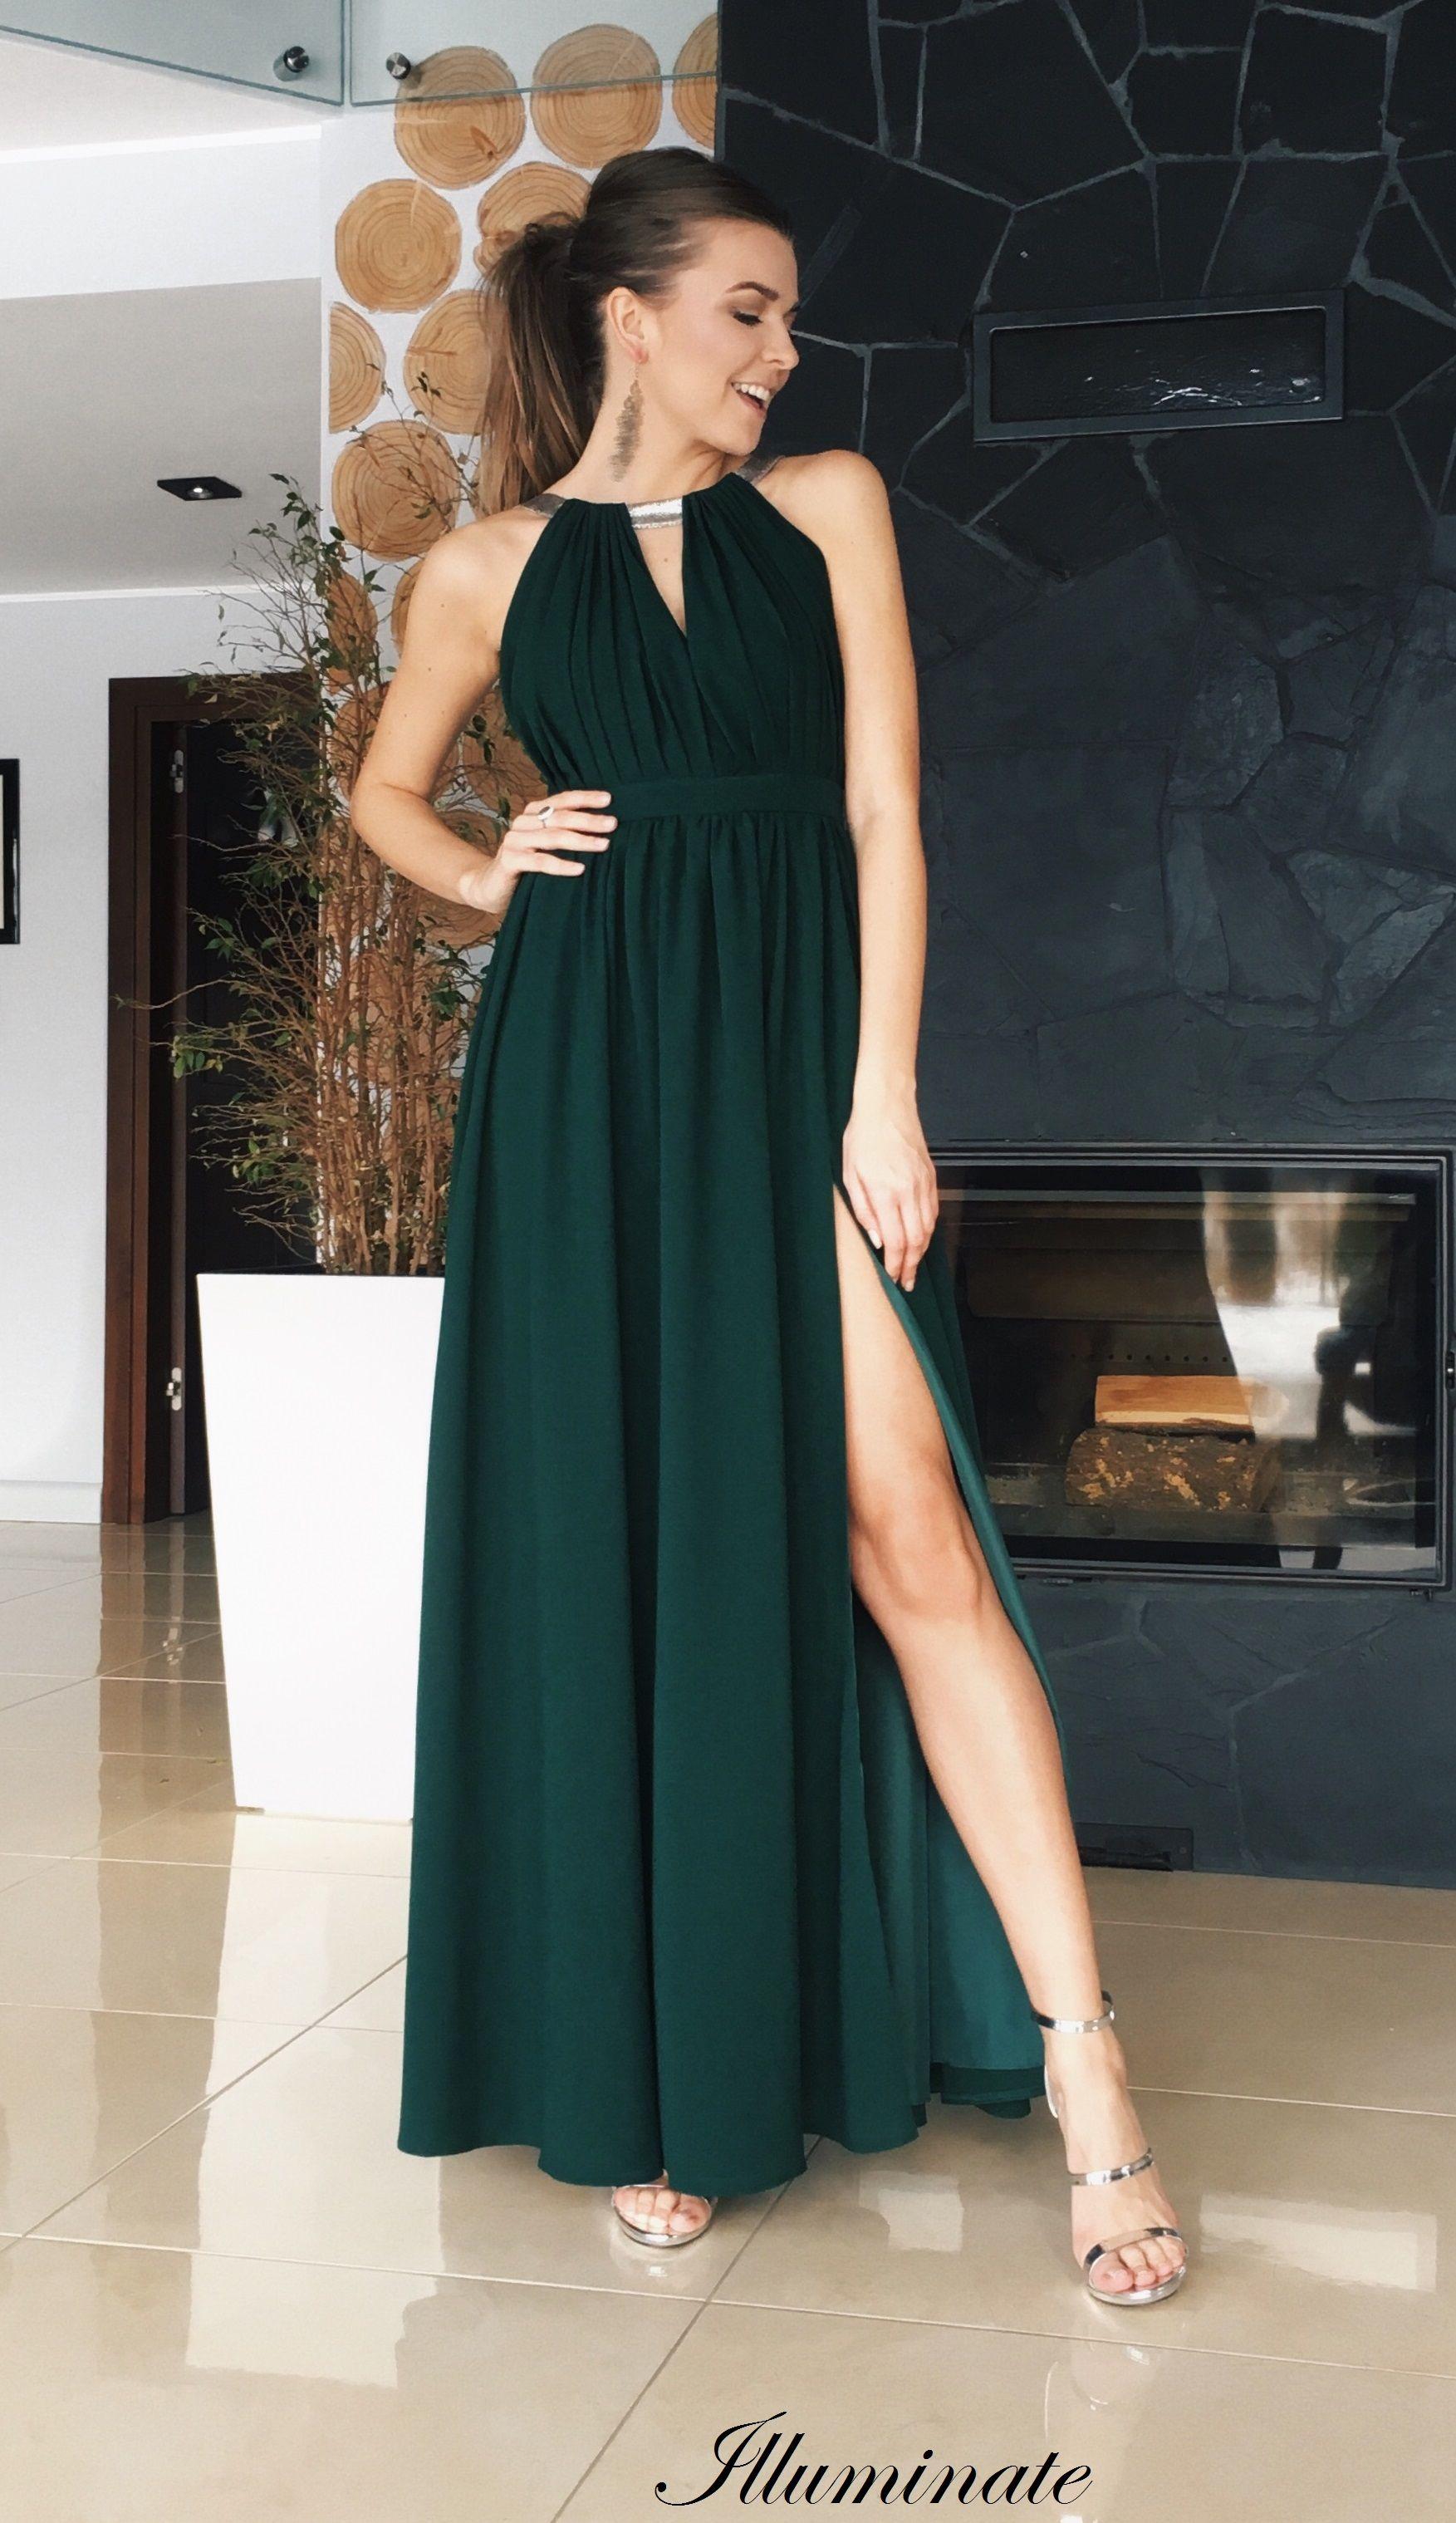 9cc4c12bf7 Elisa długa zielona sukienka  emeraldgreen  dress  sukienka  zielona   rzymianka  maxidress  swiadkowa  druhna